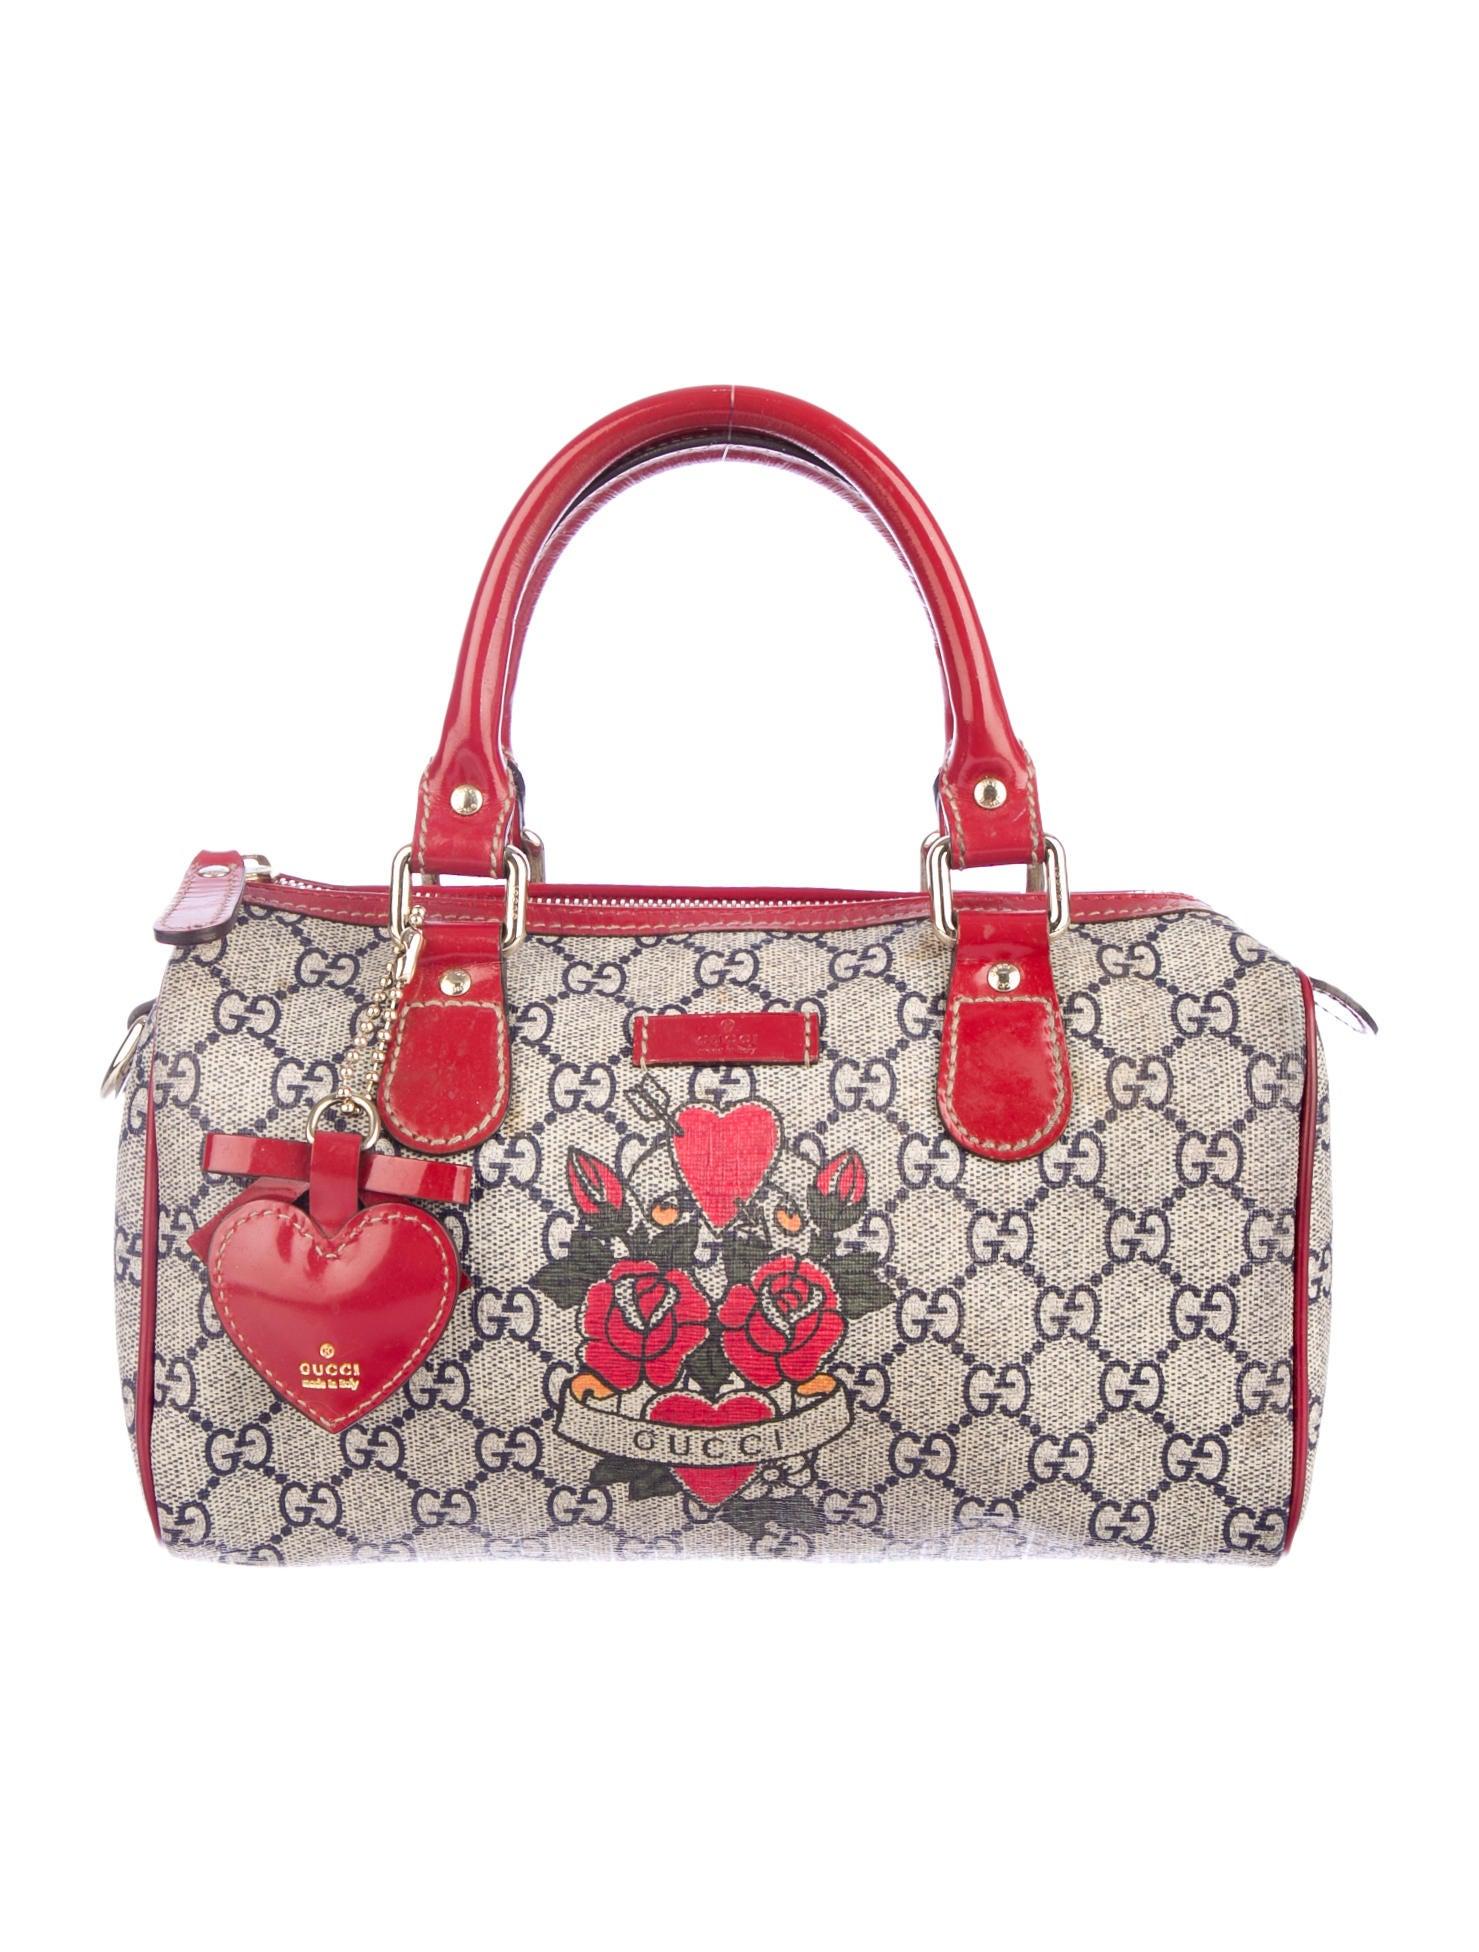 6267d88a485 Gucci Mini Tattoo Heart Joy Boston Bag - Handbags - GUC37454